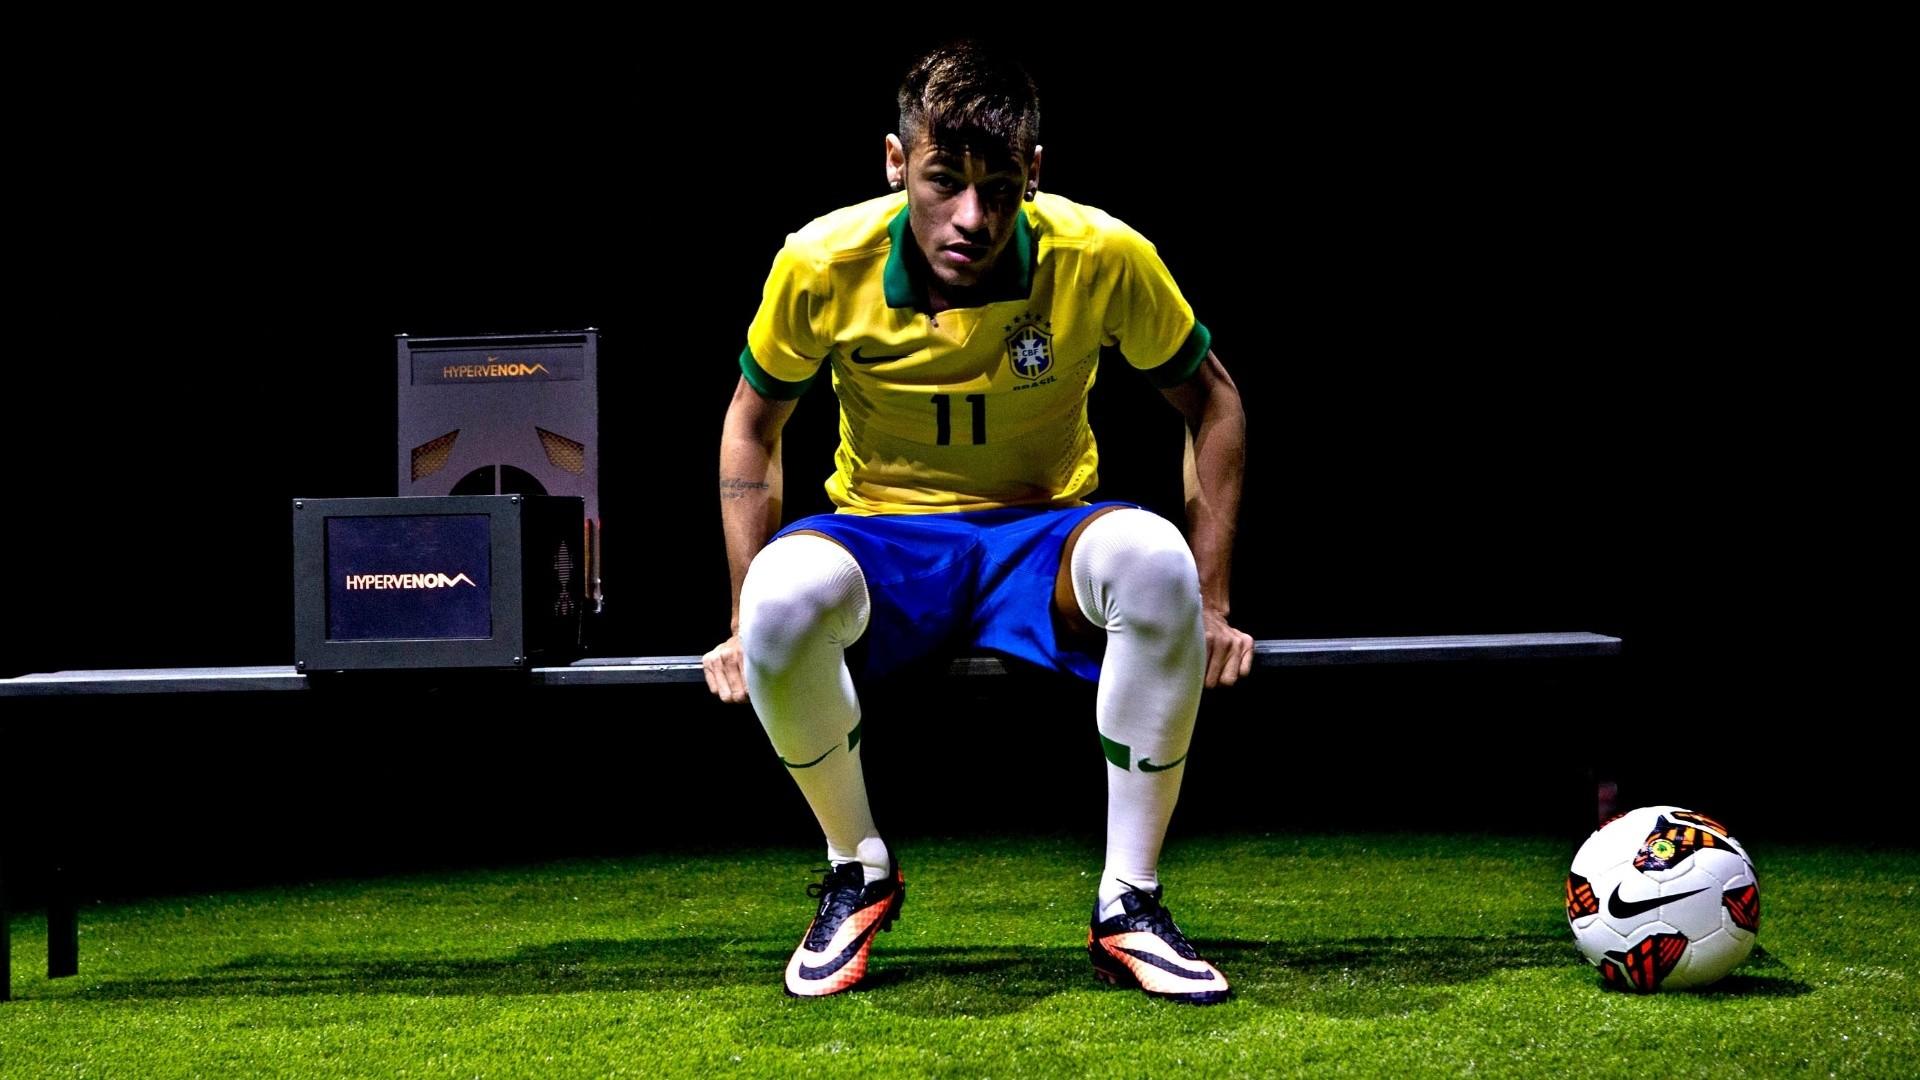 World Cup 2014 Neymar Jr